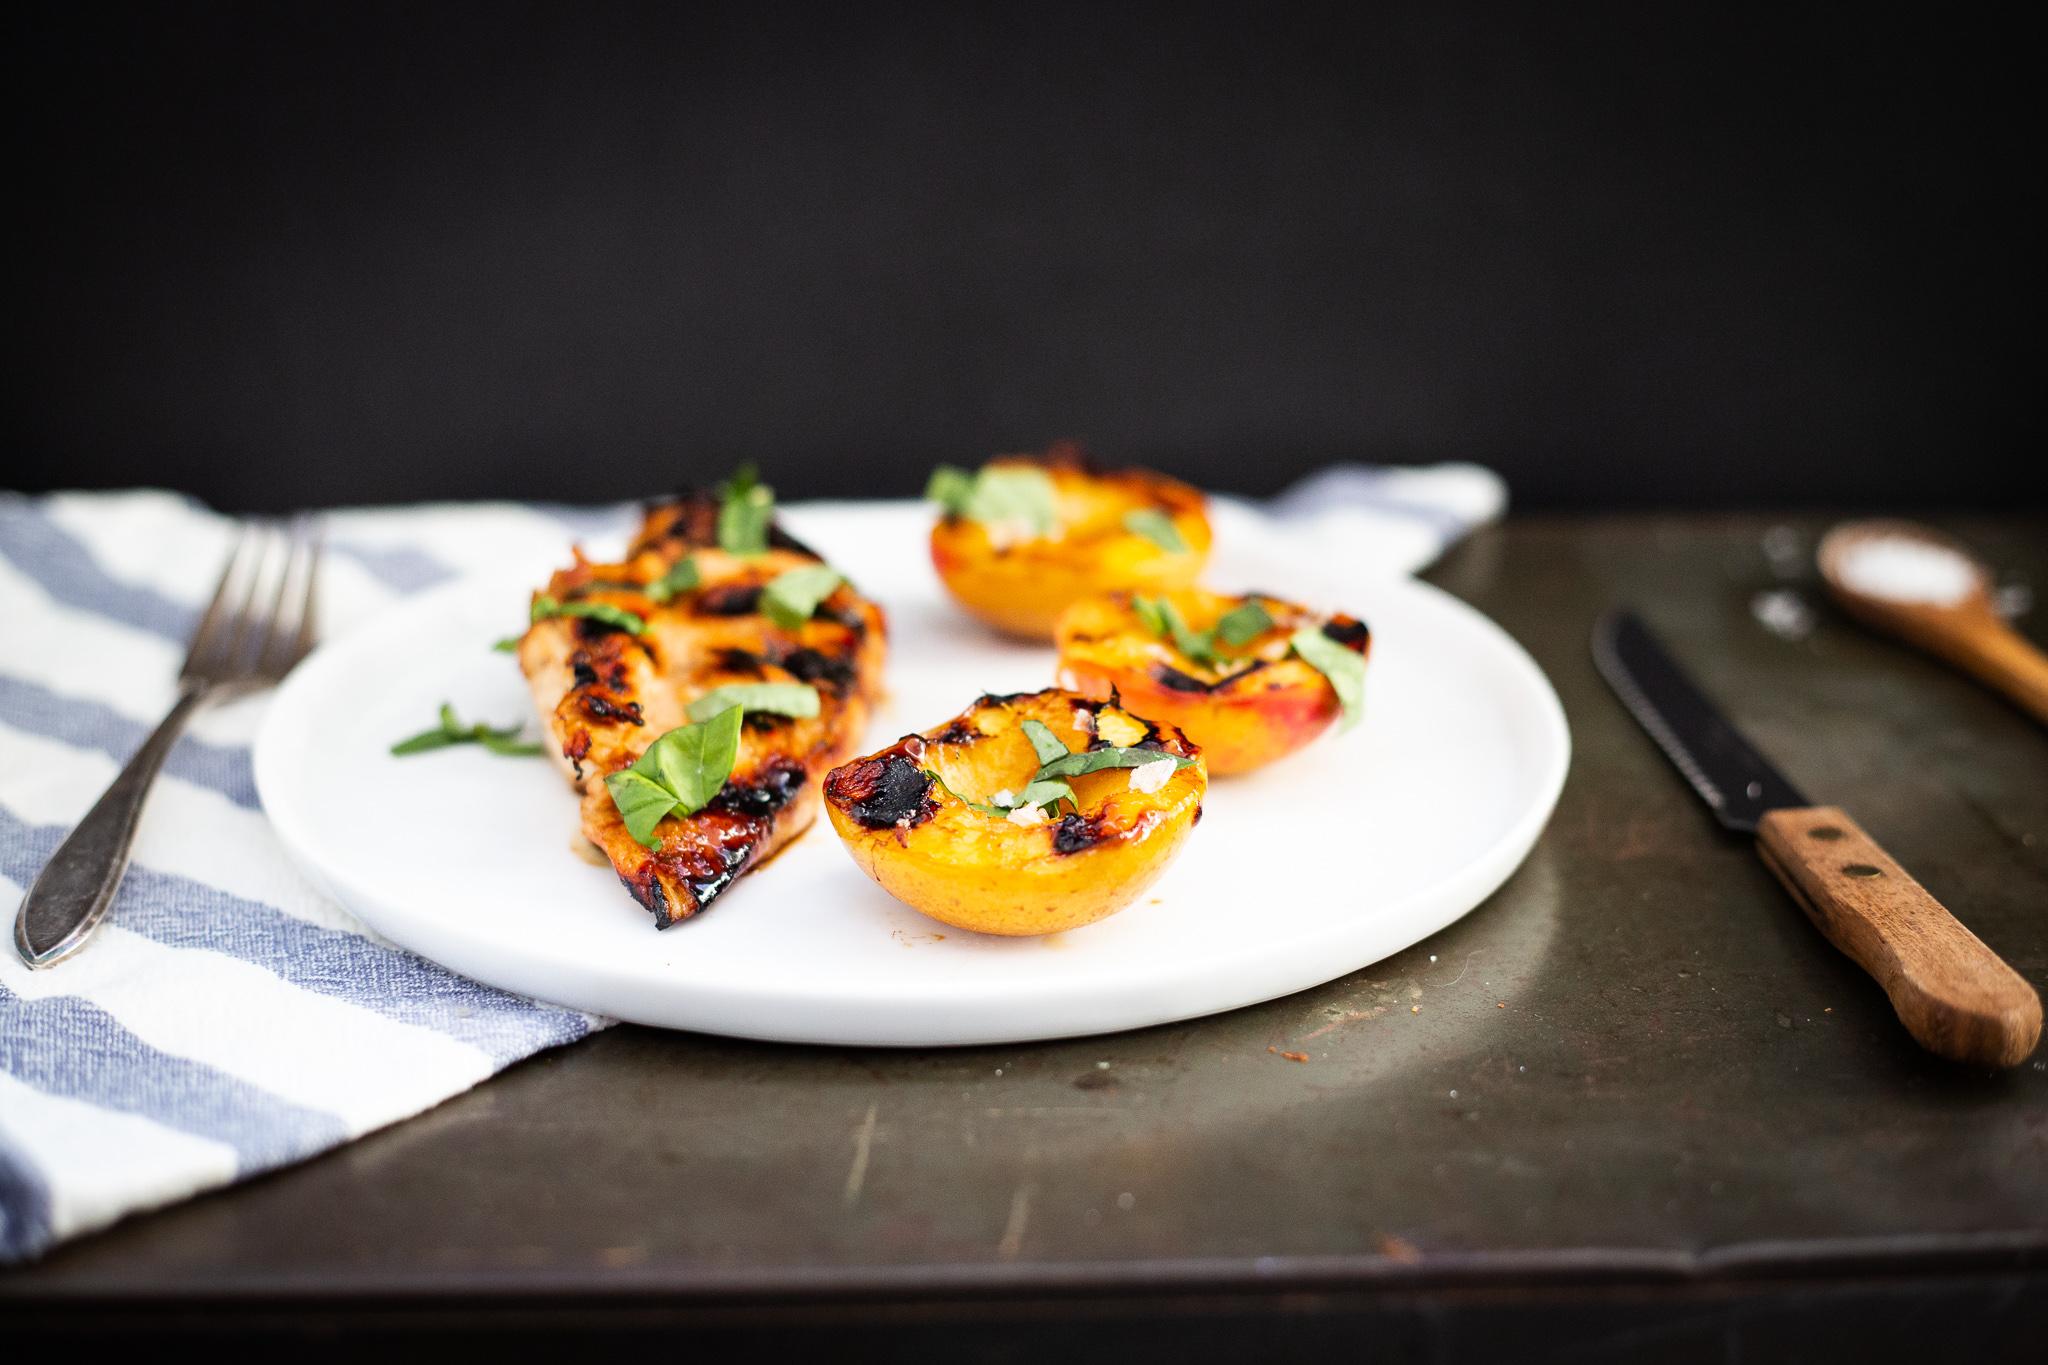 Easy Summer Dinner: Honey Glazed Chicken with Grilled Nectarines